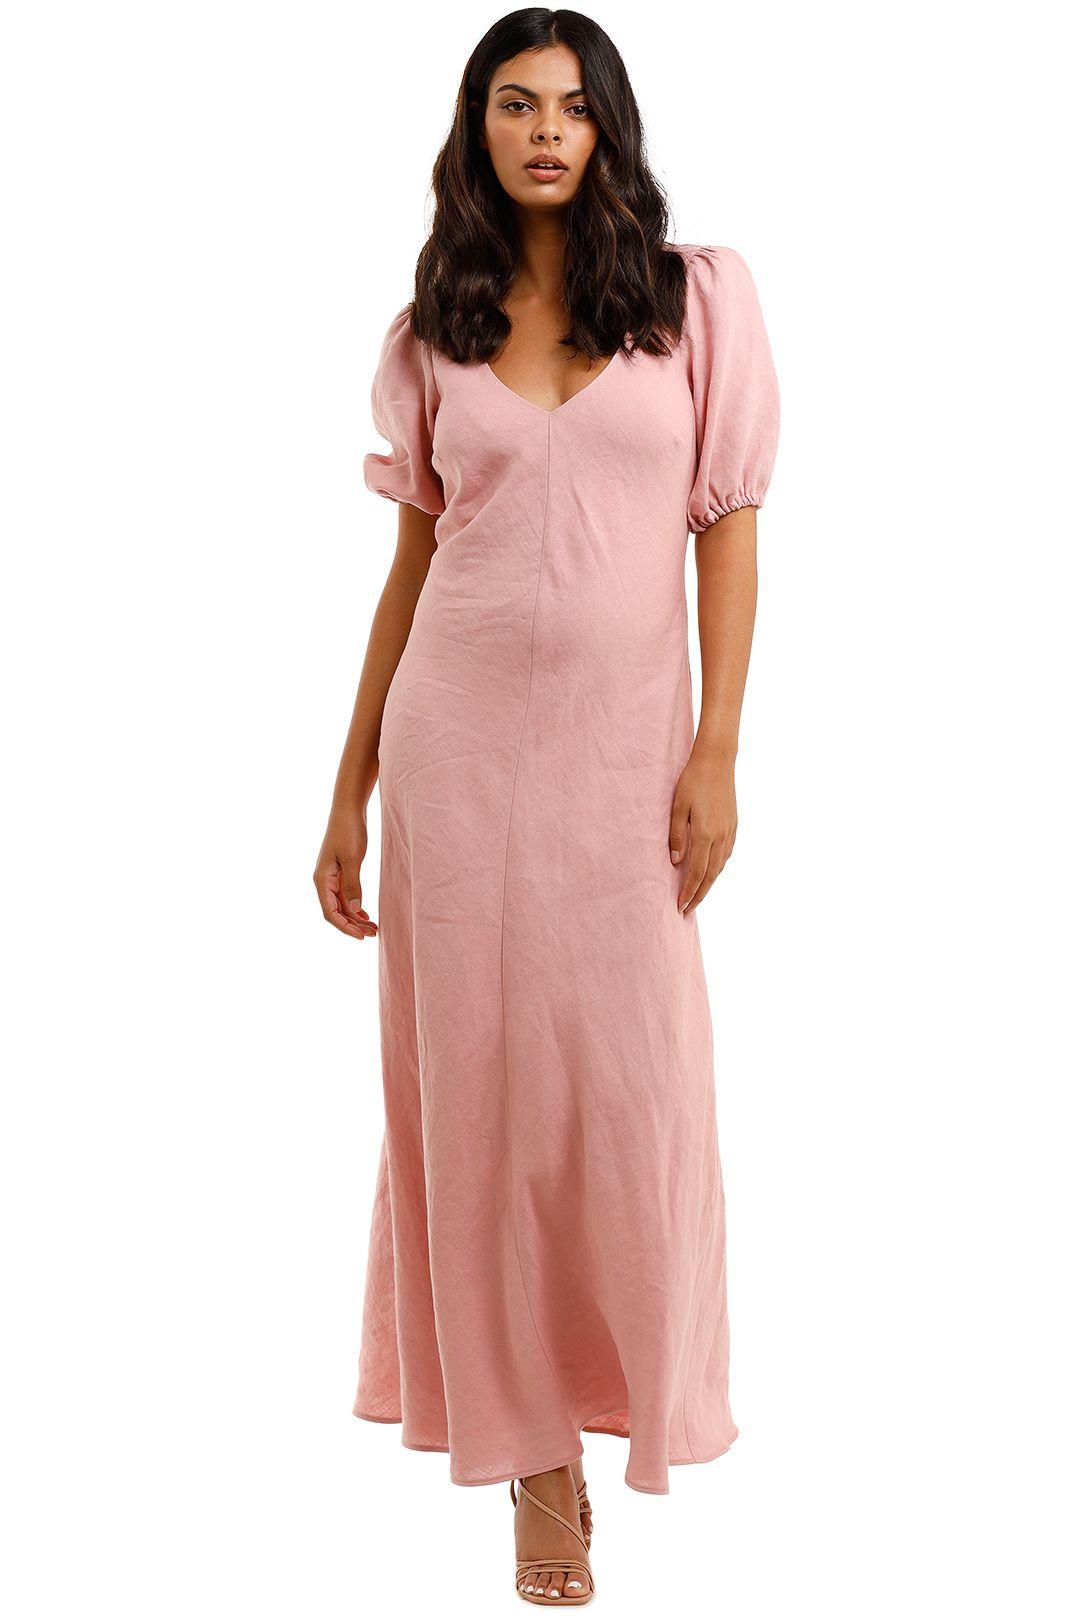 Jillian Boustred Phillipa Dress